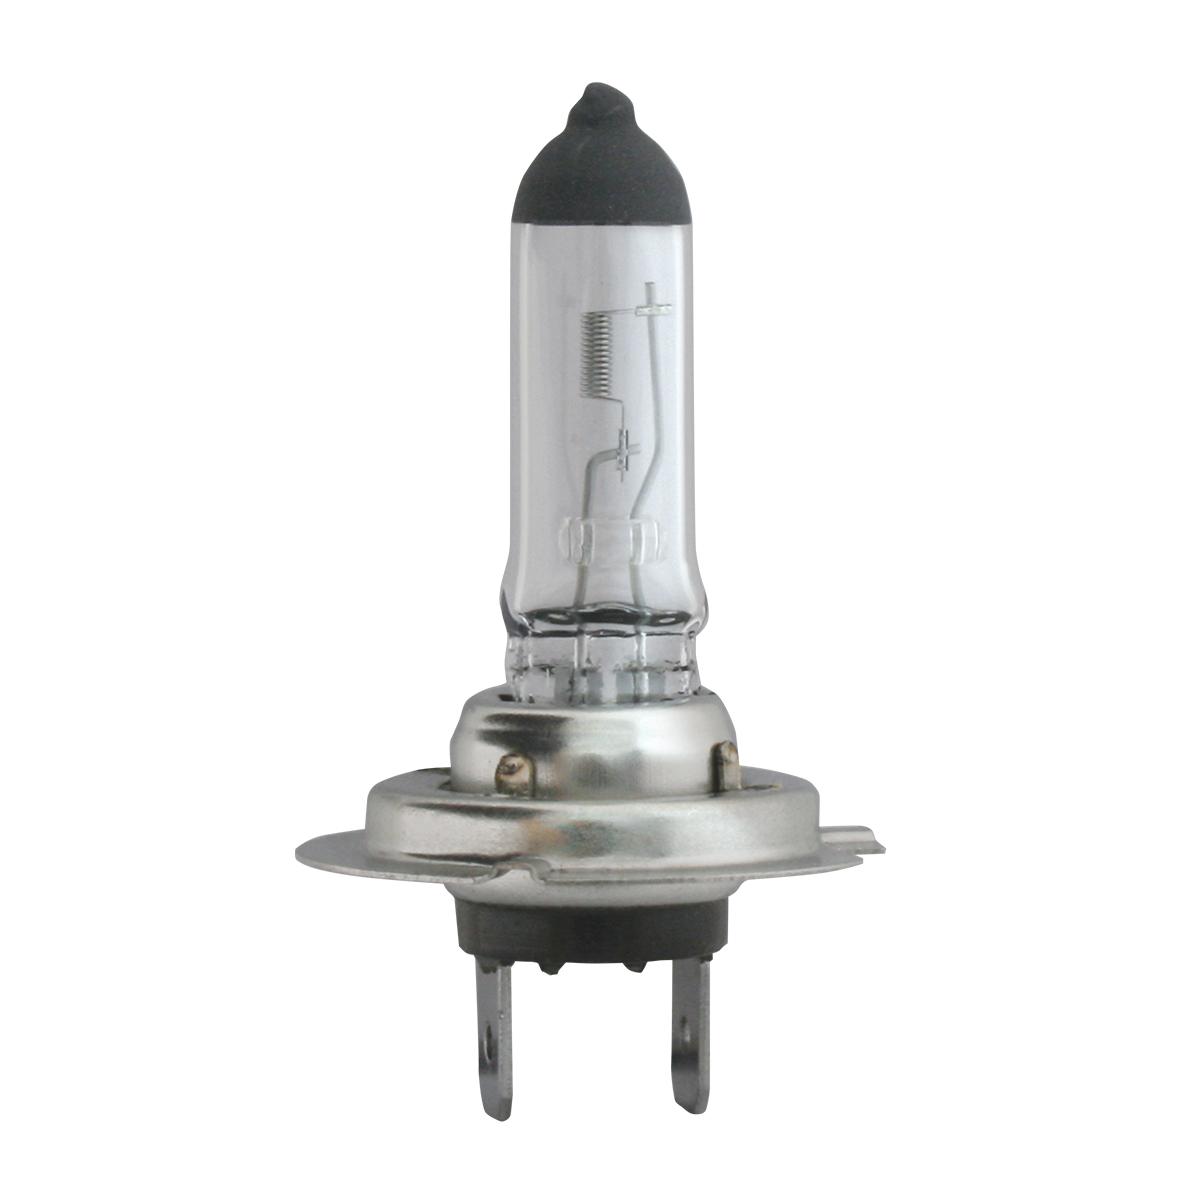 82058 H7 Headlight Halogen Bulb